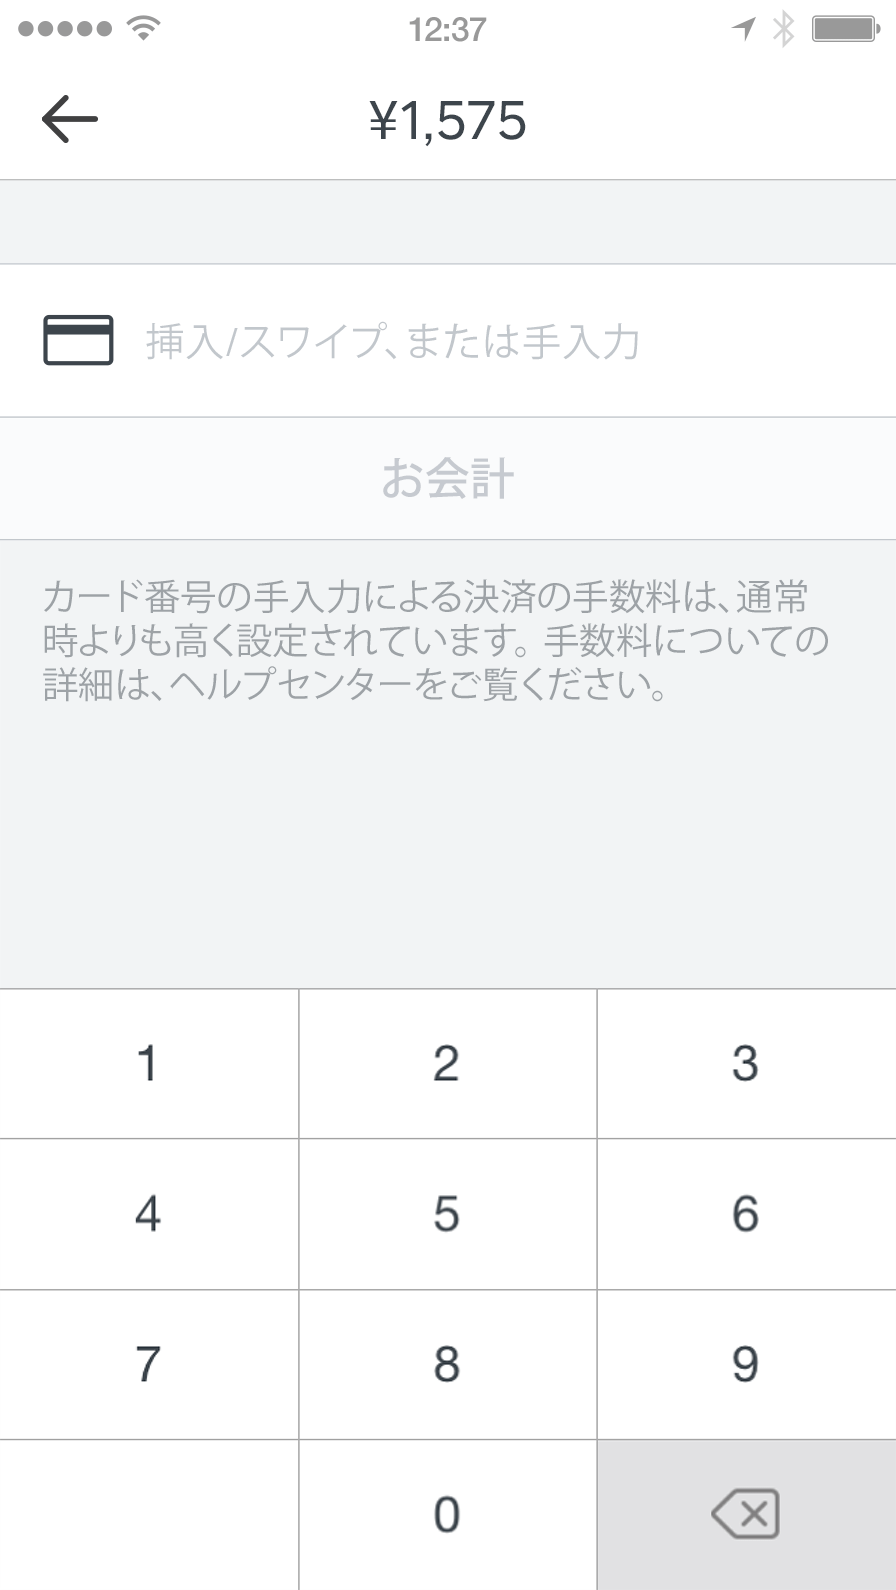 card information